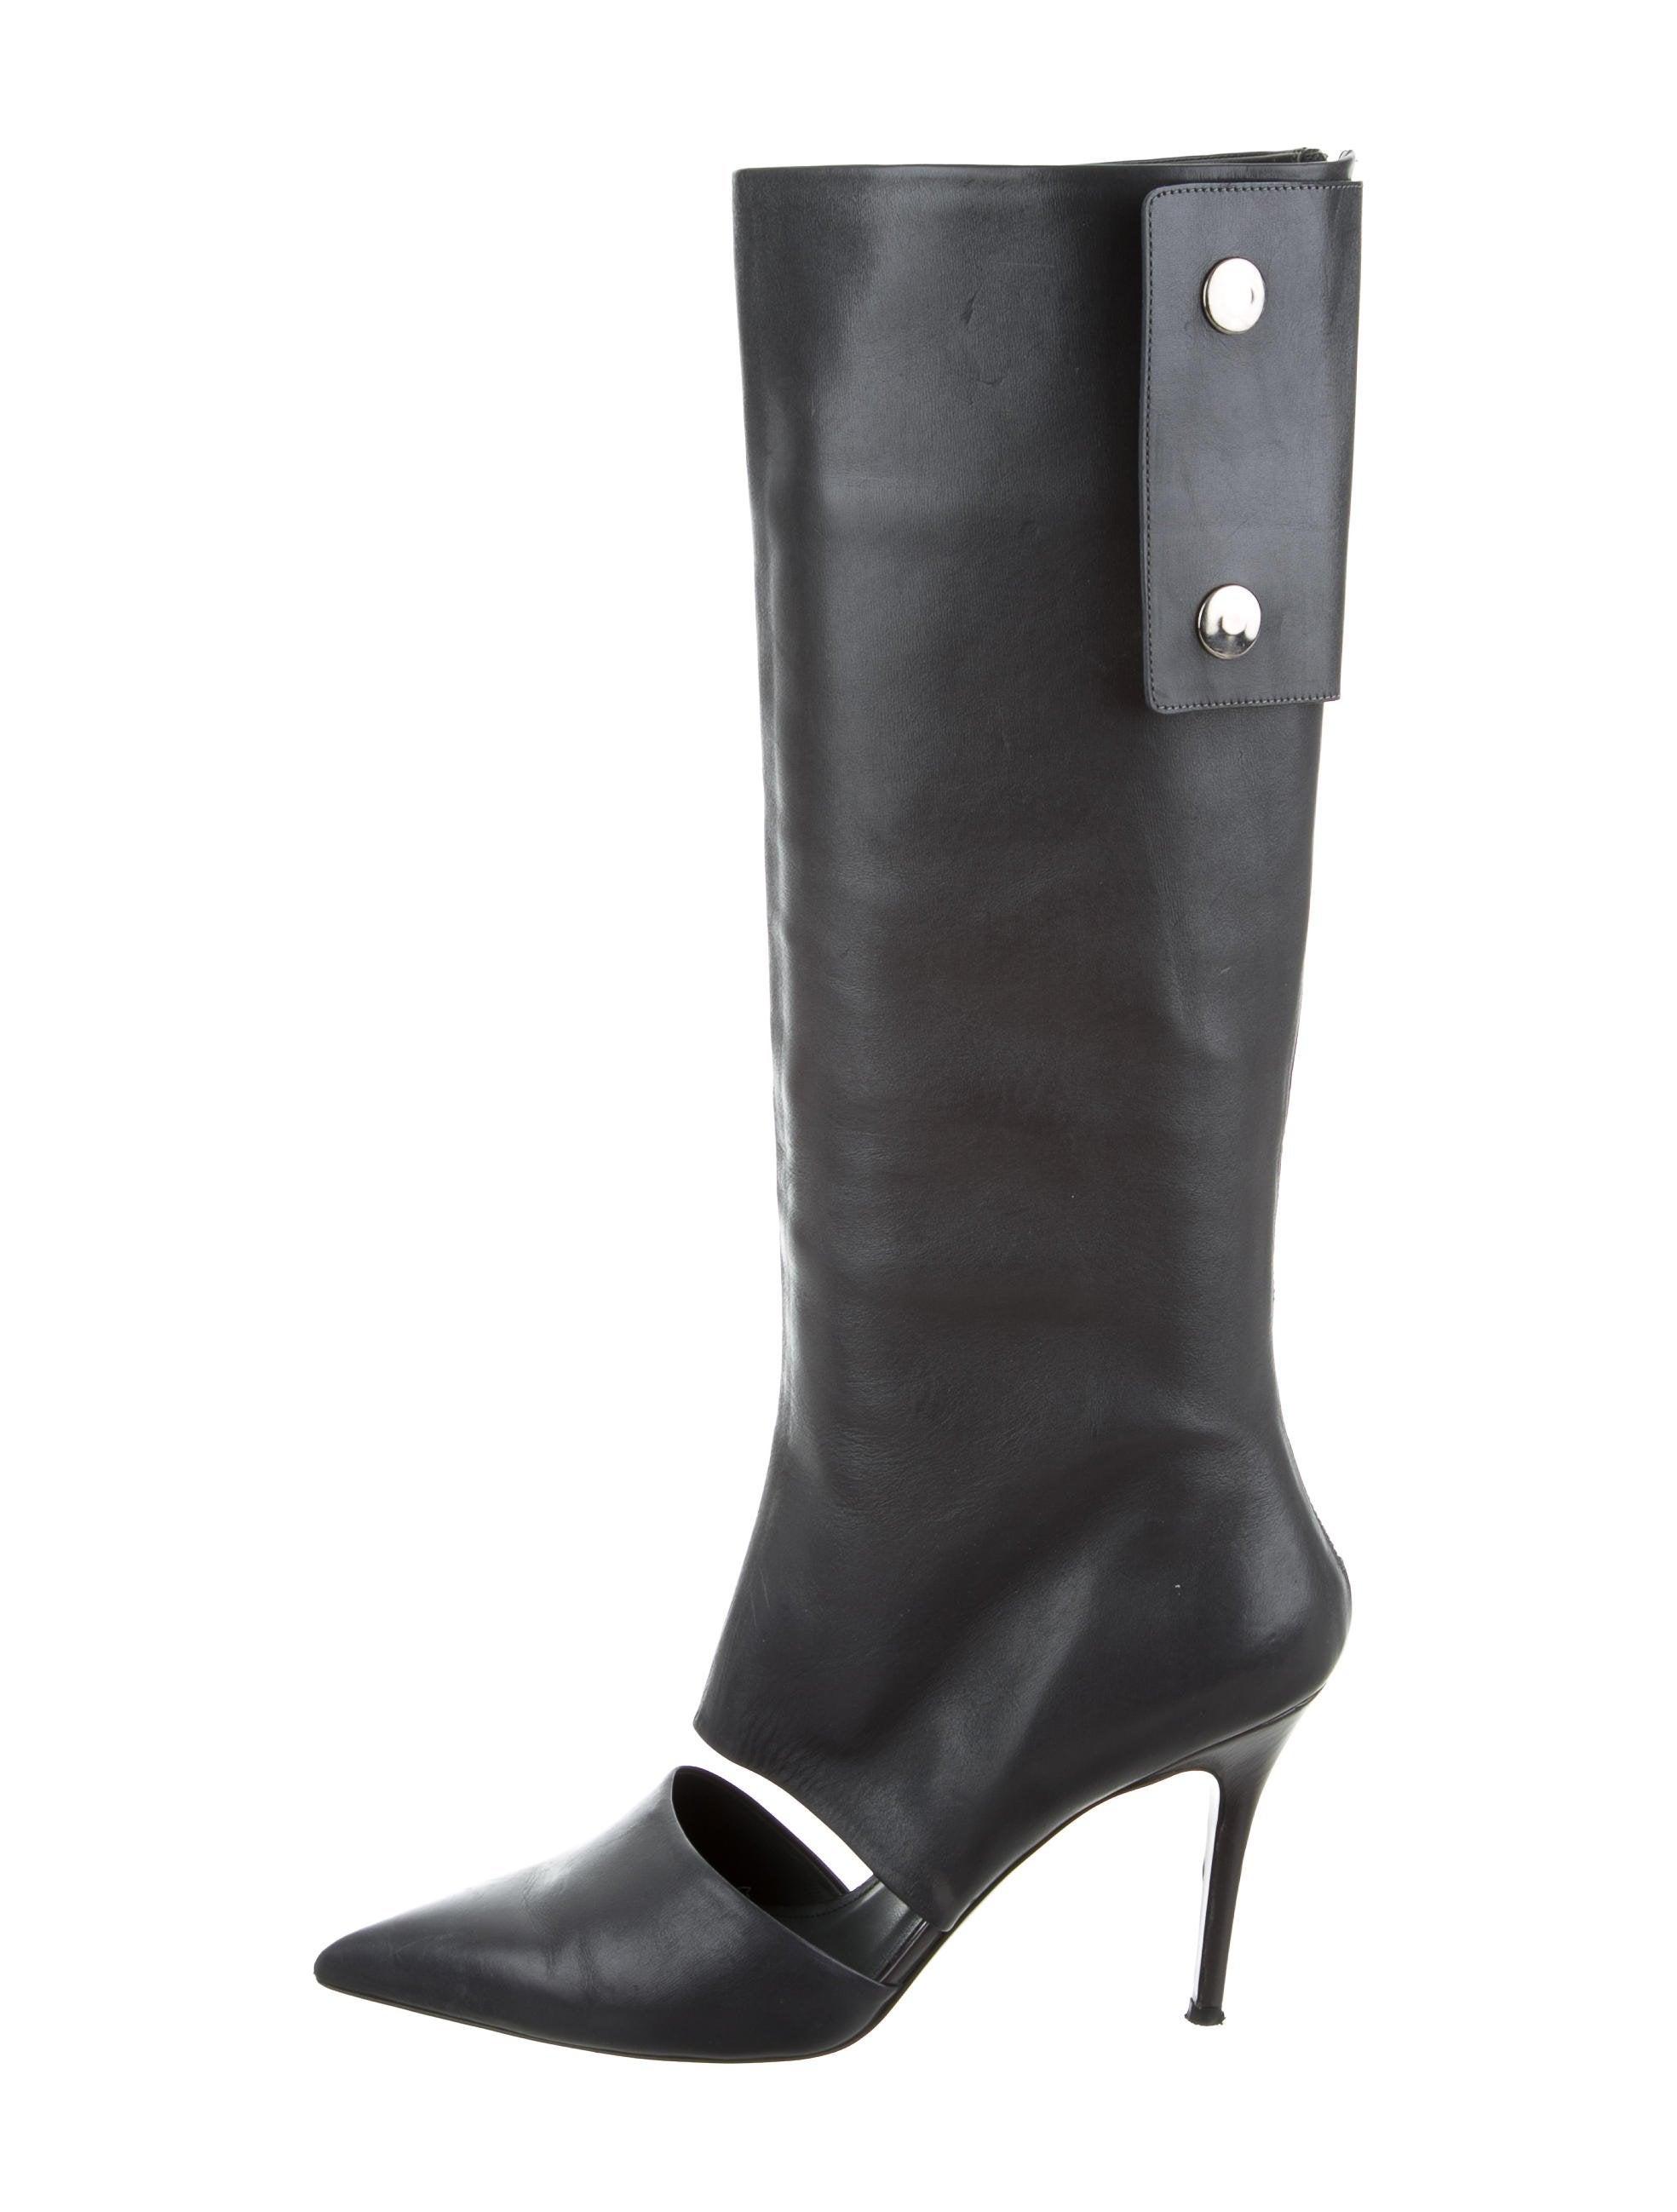 find great online Salvatore Ferragamo Cutout Knee-High Boots buy cheap marketable free shipping low cost cheap sale enjoy sale brand new unisex u2OJ5kTL4